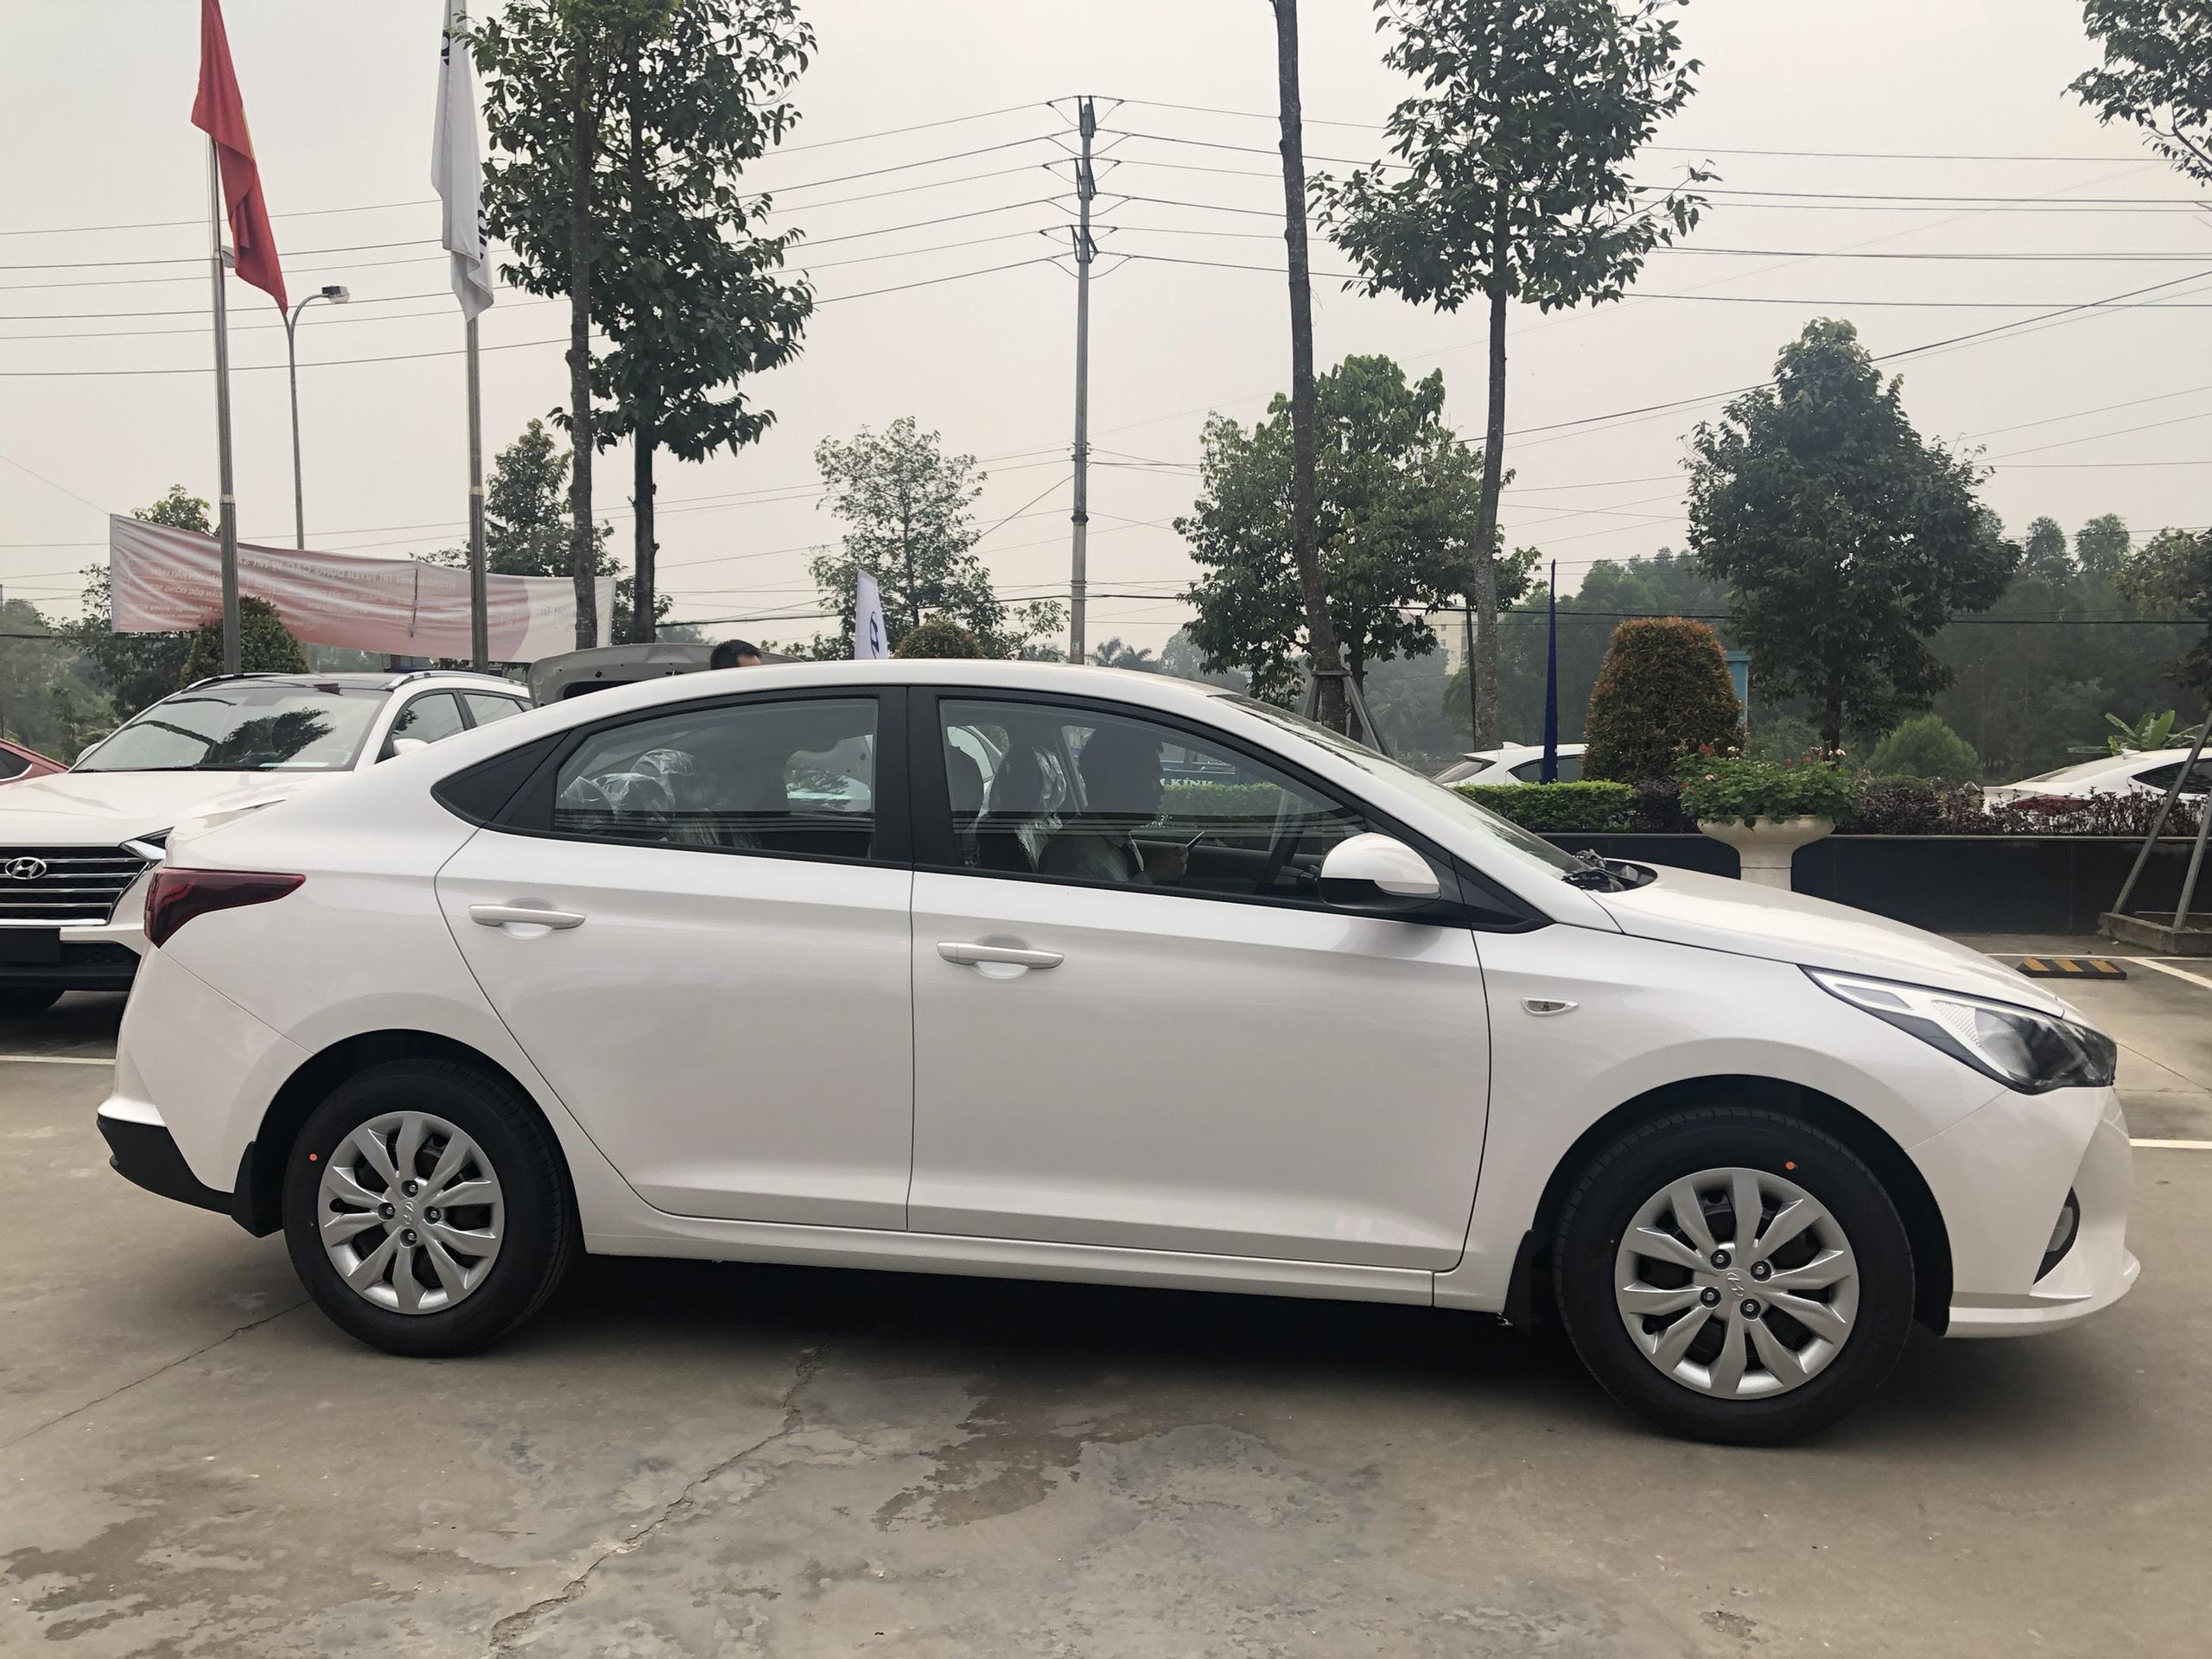 Hyundai Accent 1.4MT Base